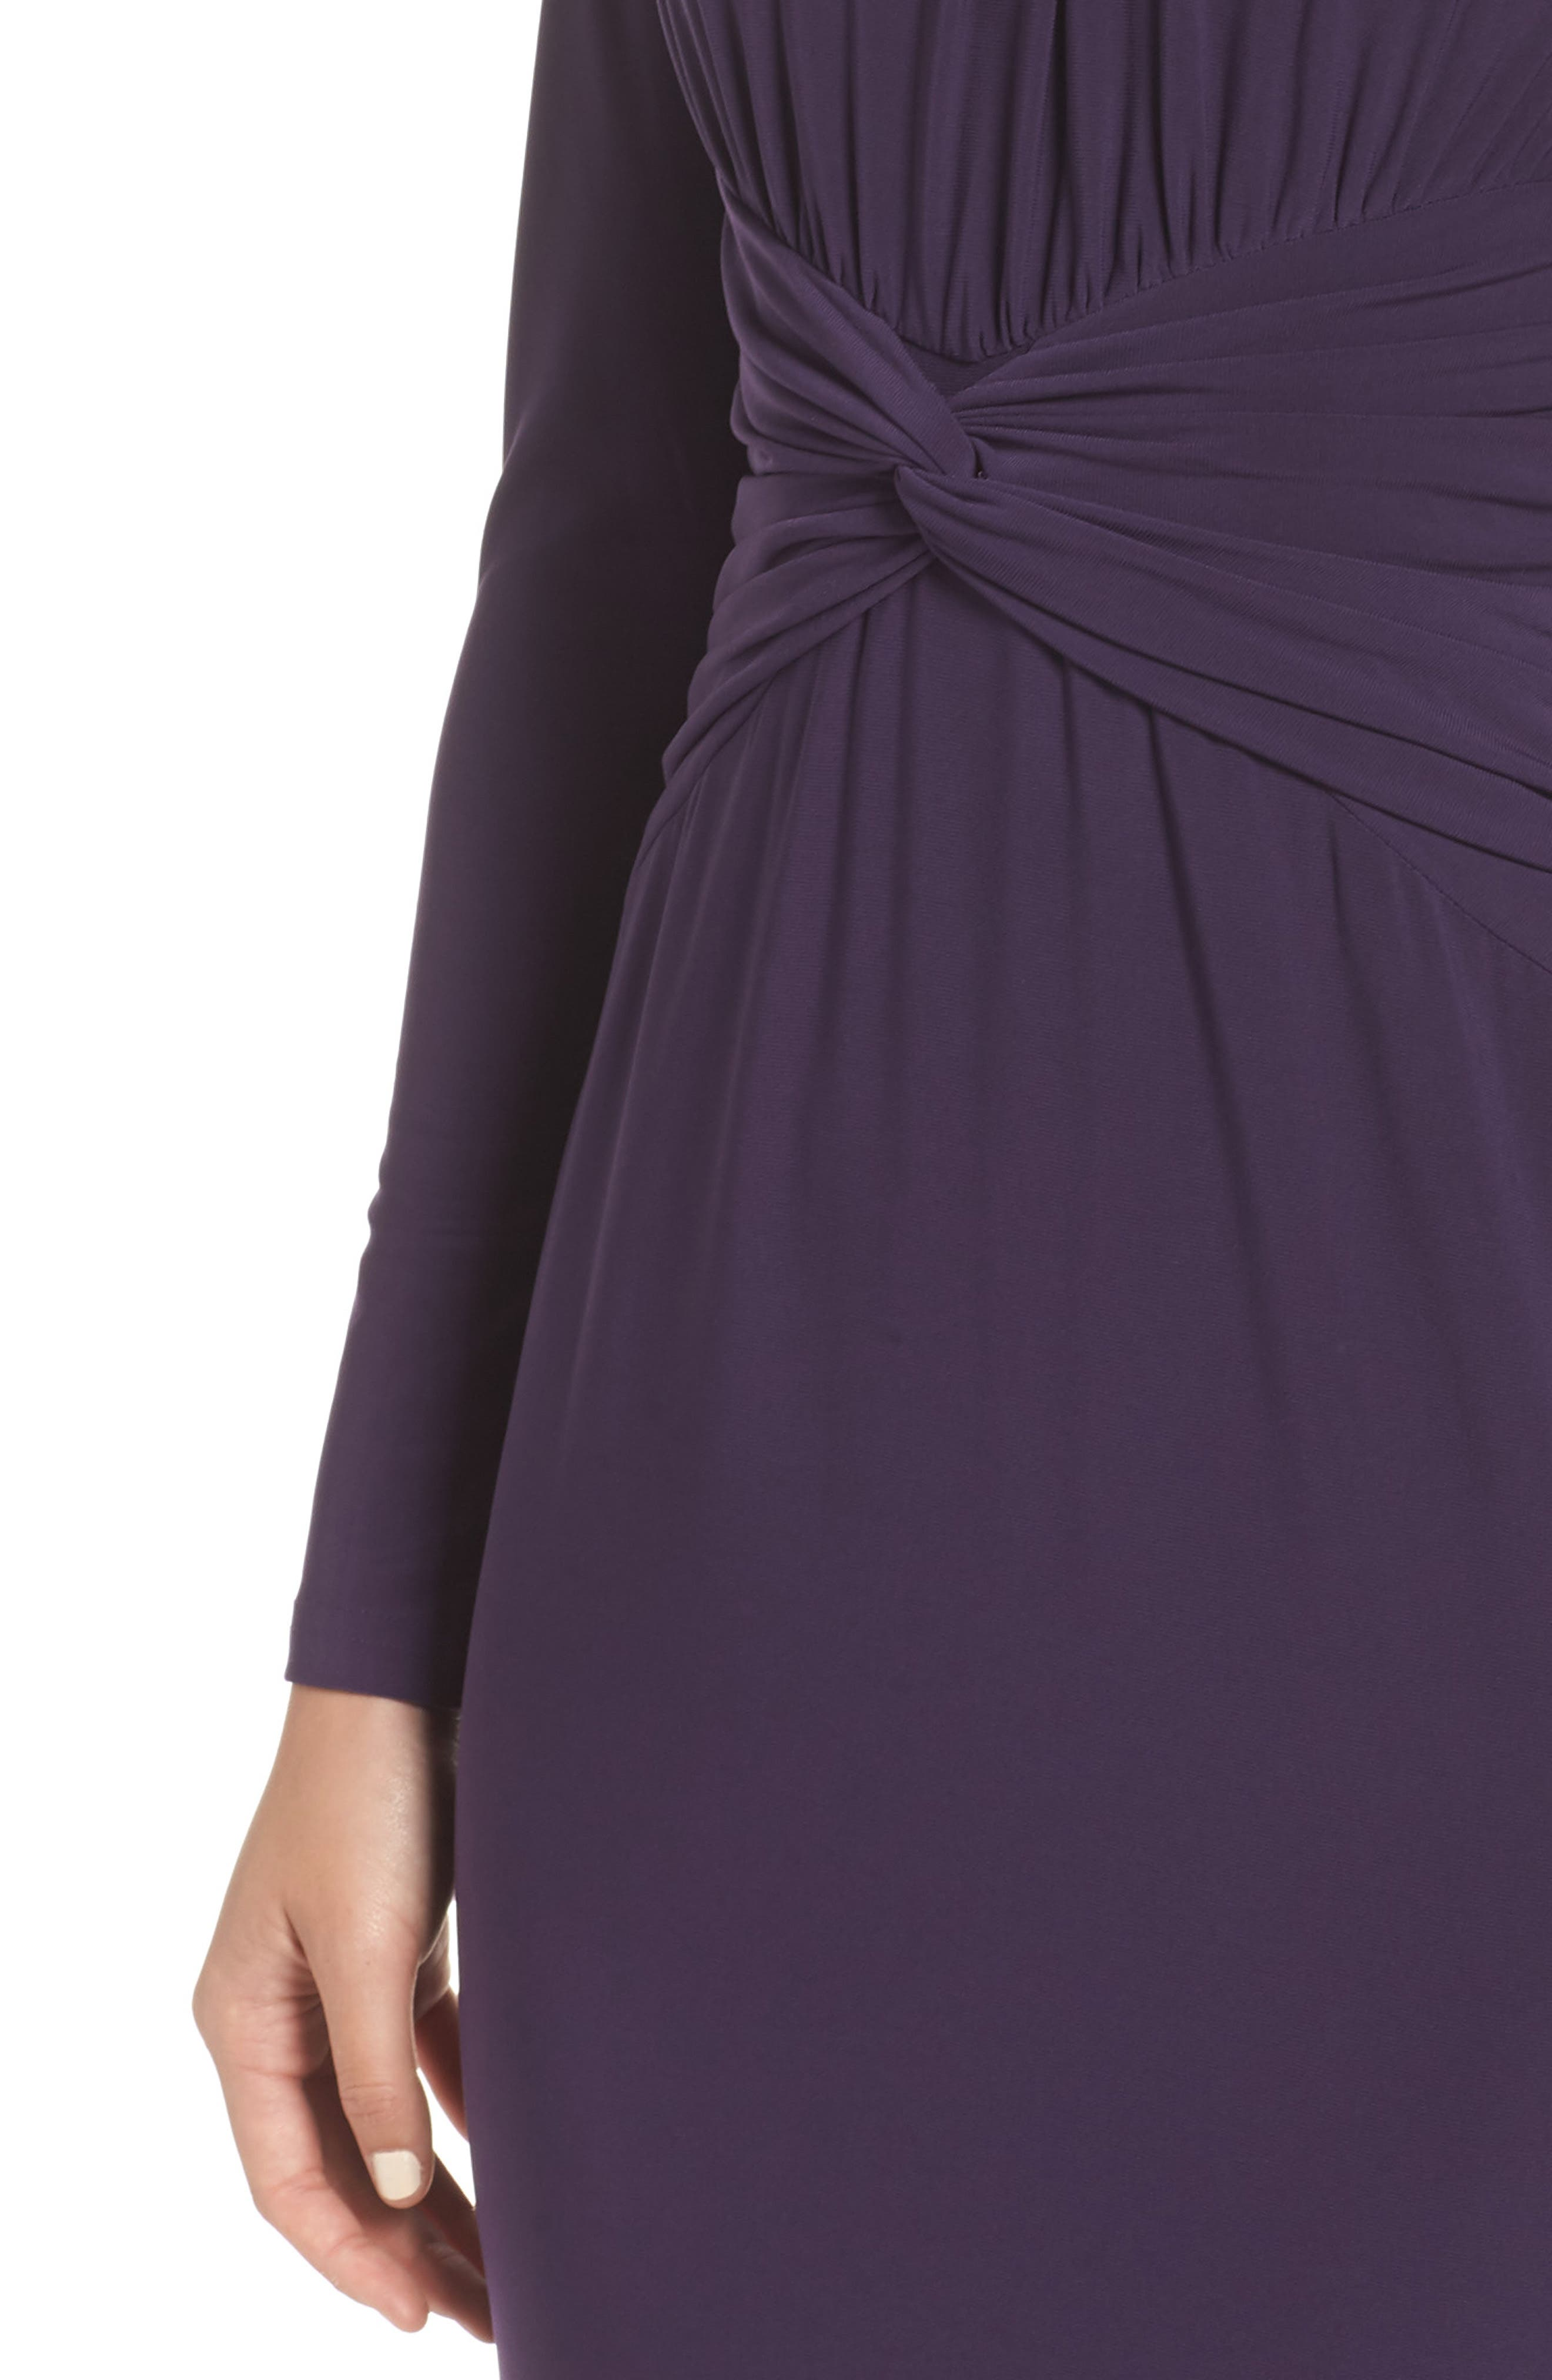 ADRIANNA PAPELL,                             Twist Waist Knit Dress,                             Alternate thumbnail 4, color,                             501